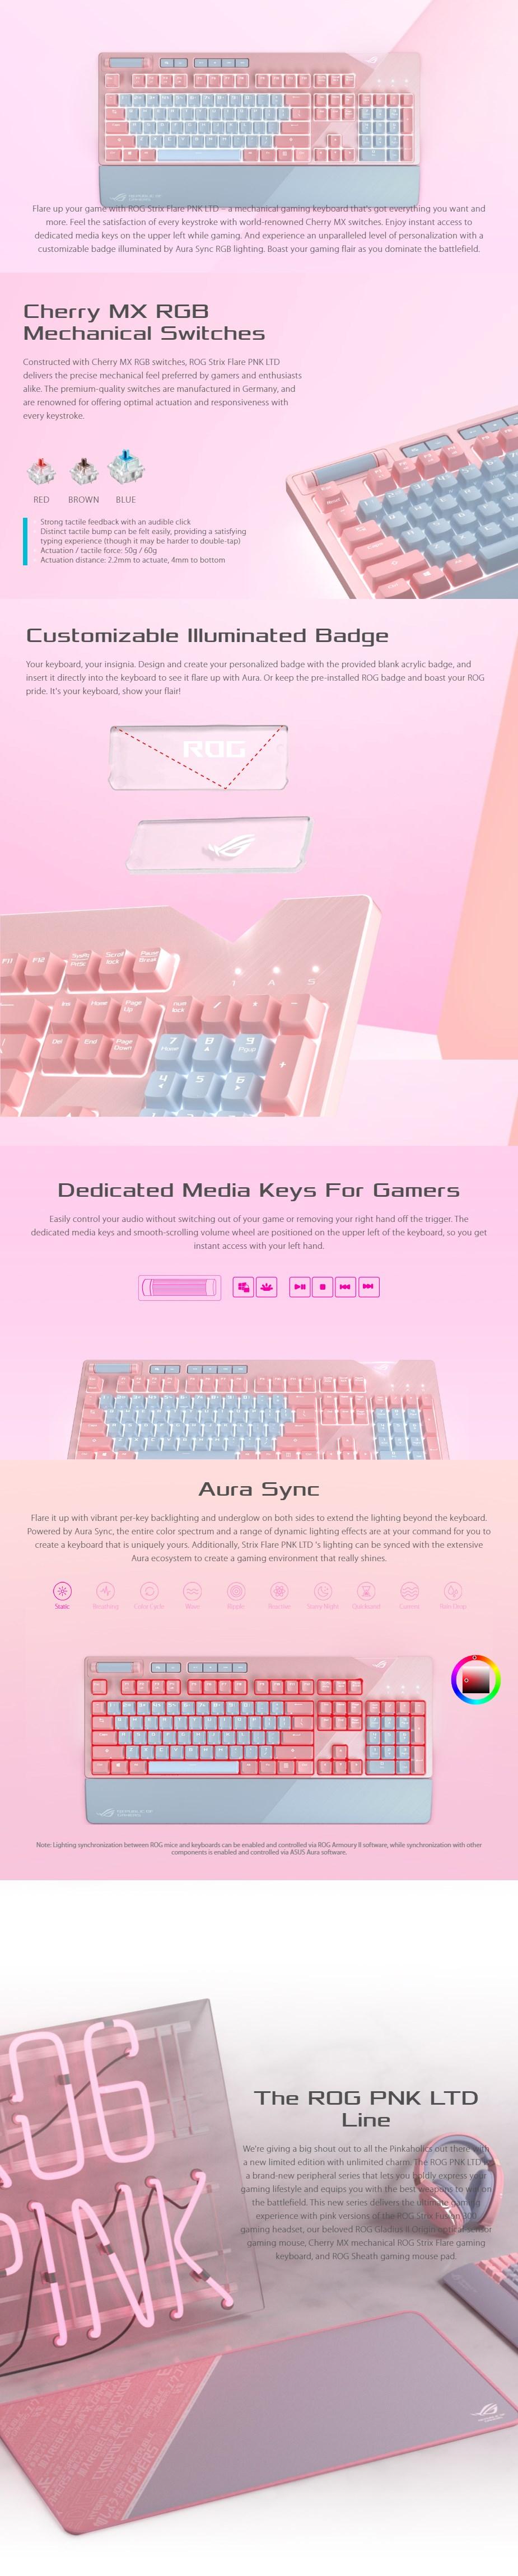 asus-rog-strix-flare-mechanical-gaming-keyboard-cherry-mx-blue-pink-edition-ac28622-4.jpg